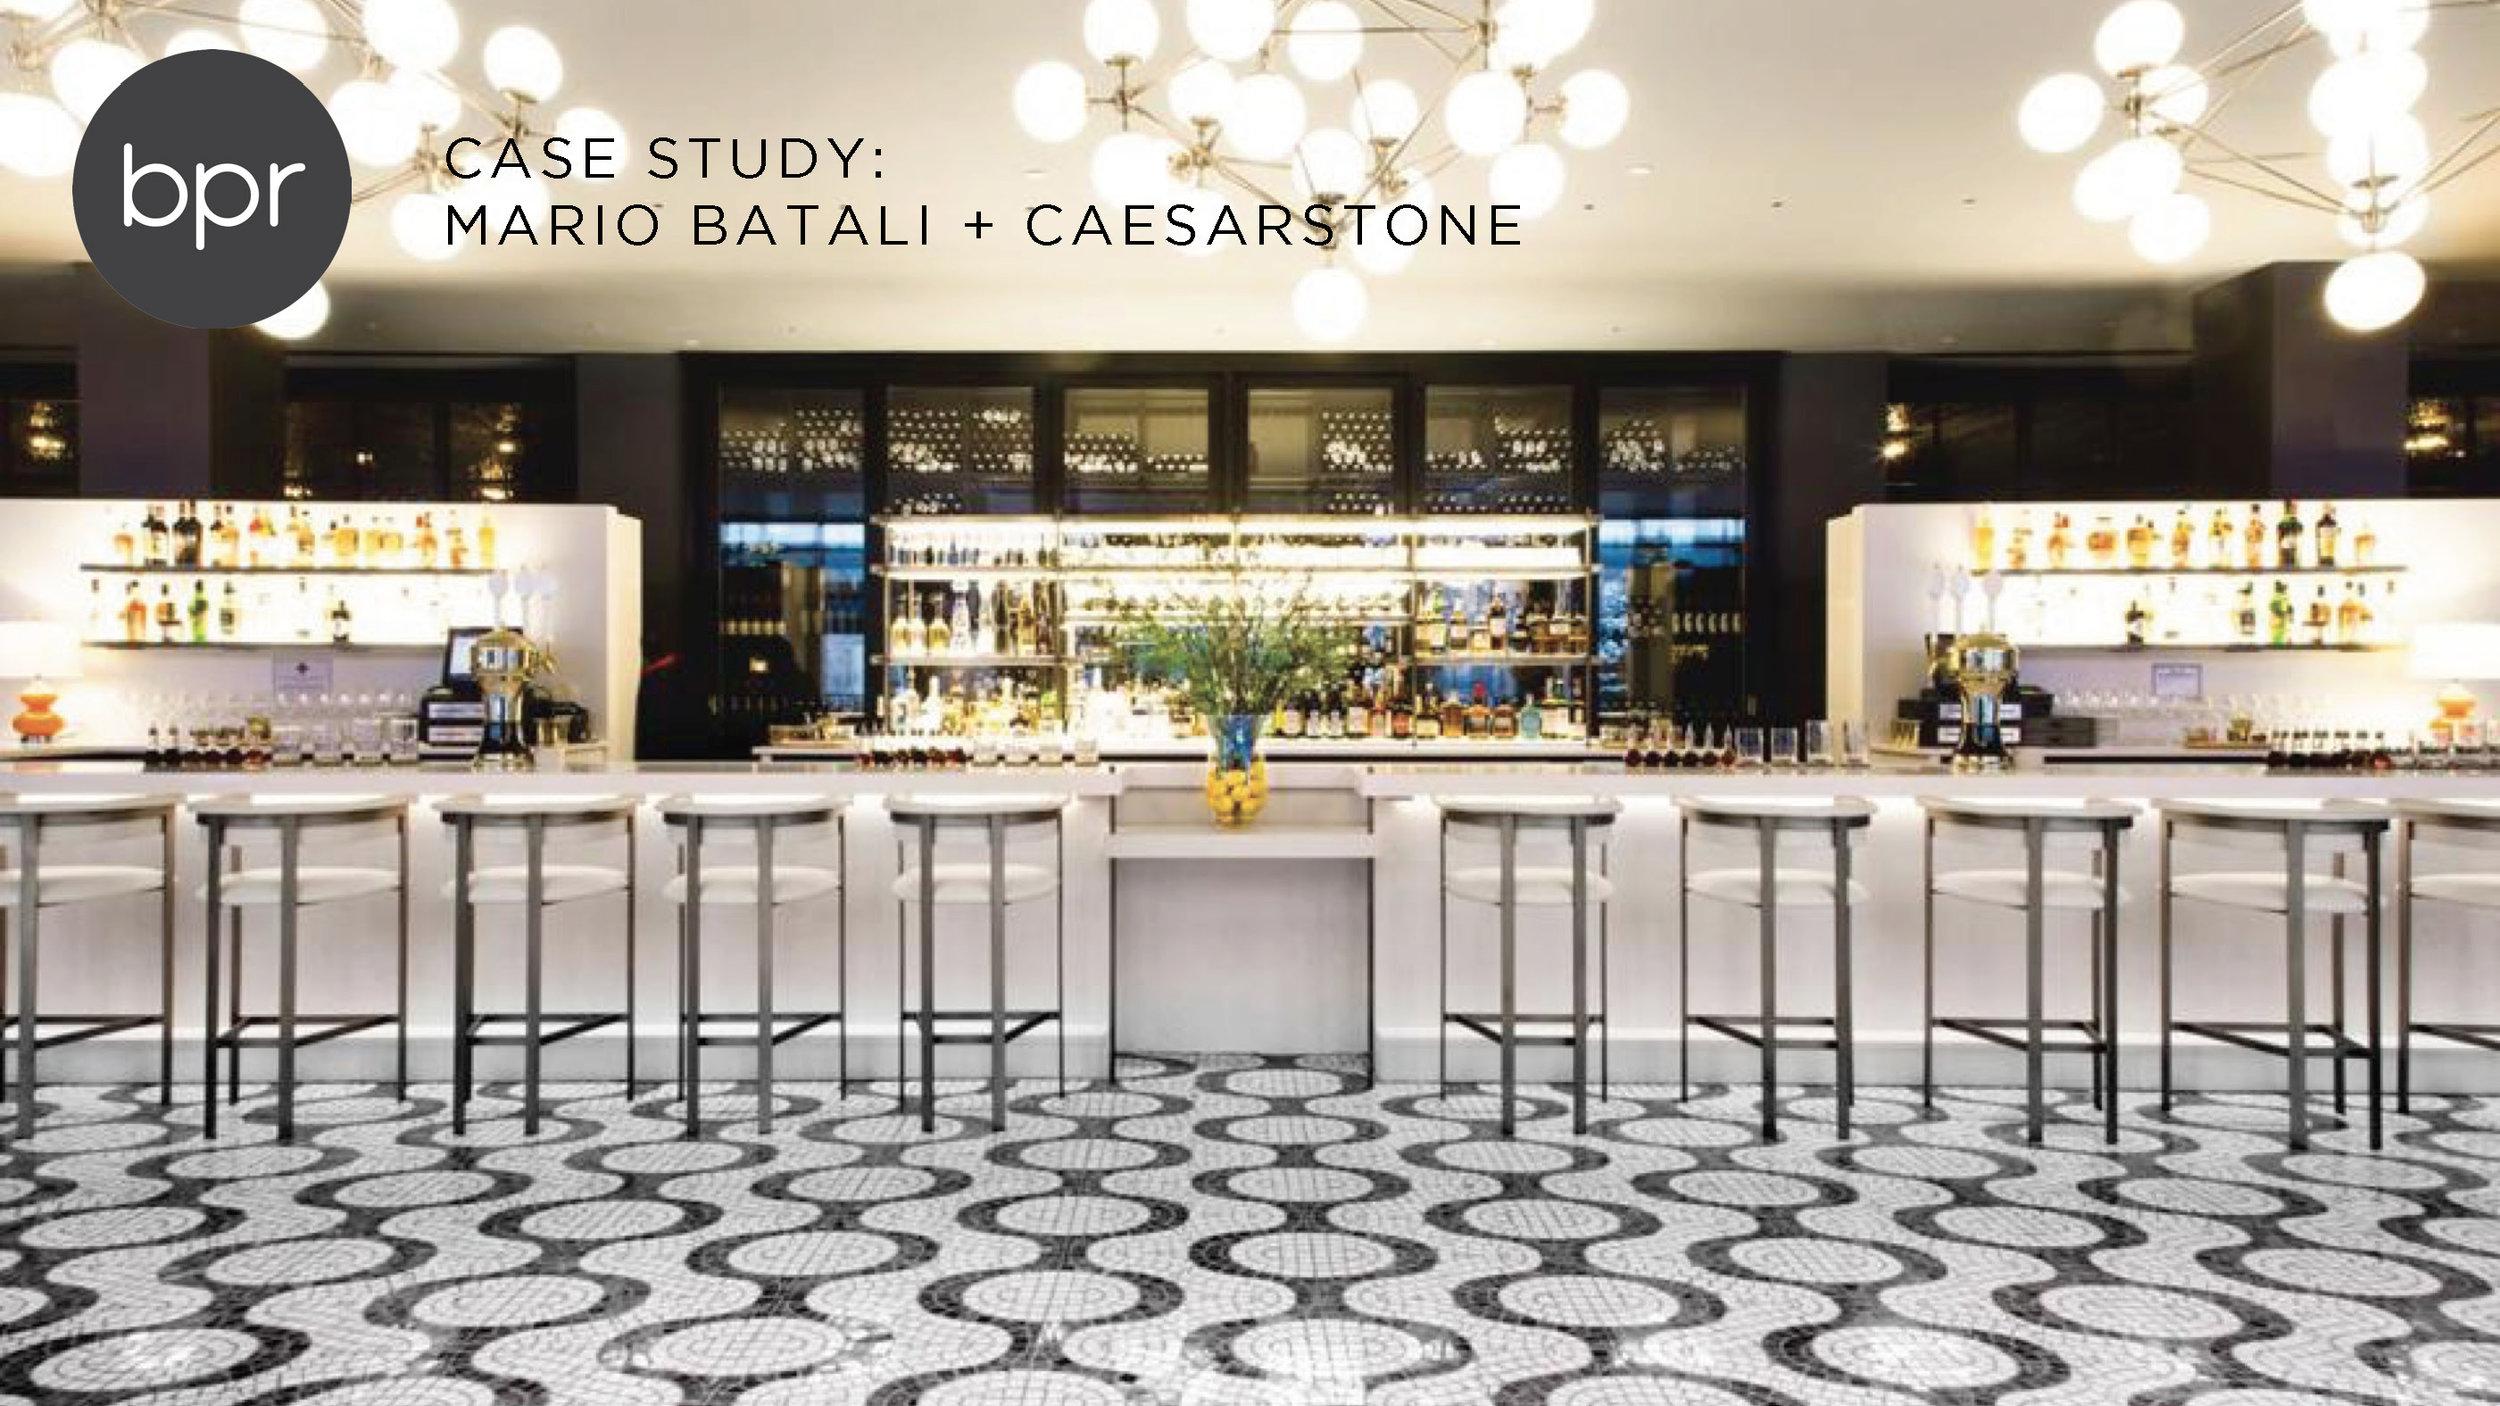 Caesarstone-Mario Batali Case Study_Page_1.jpg